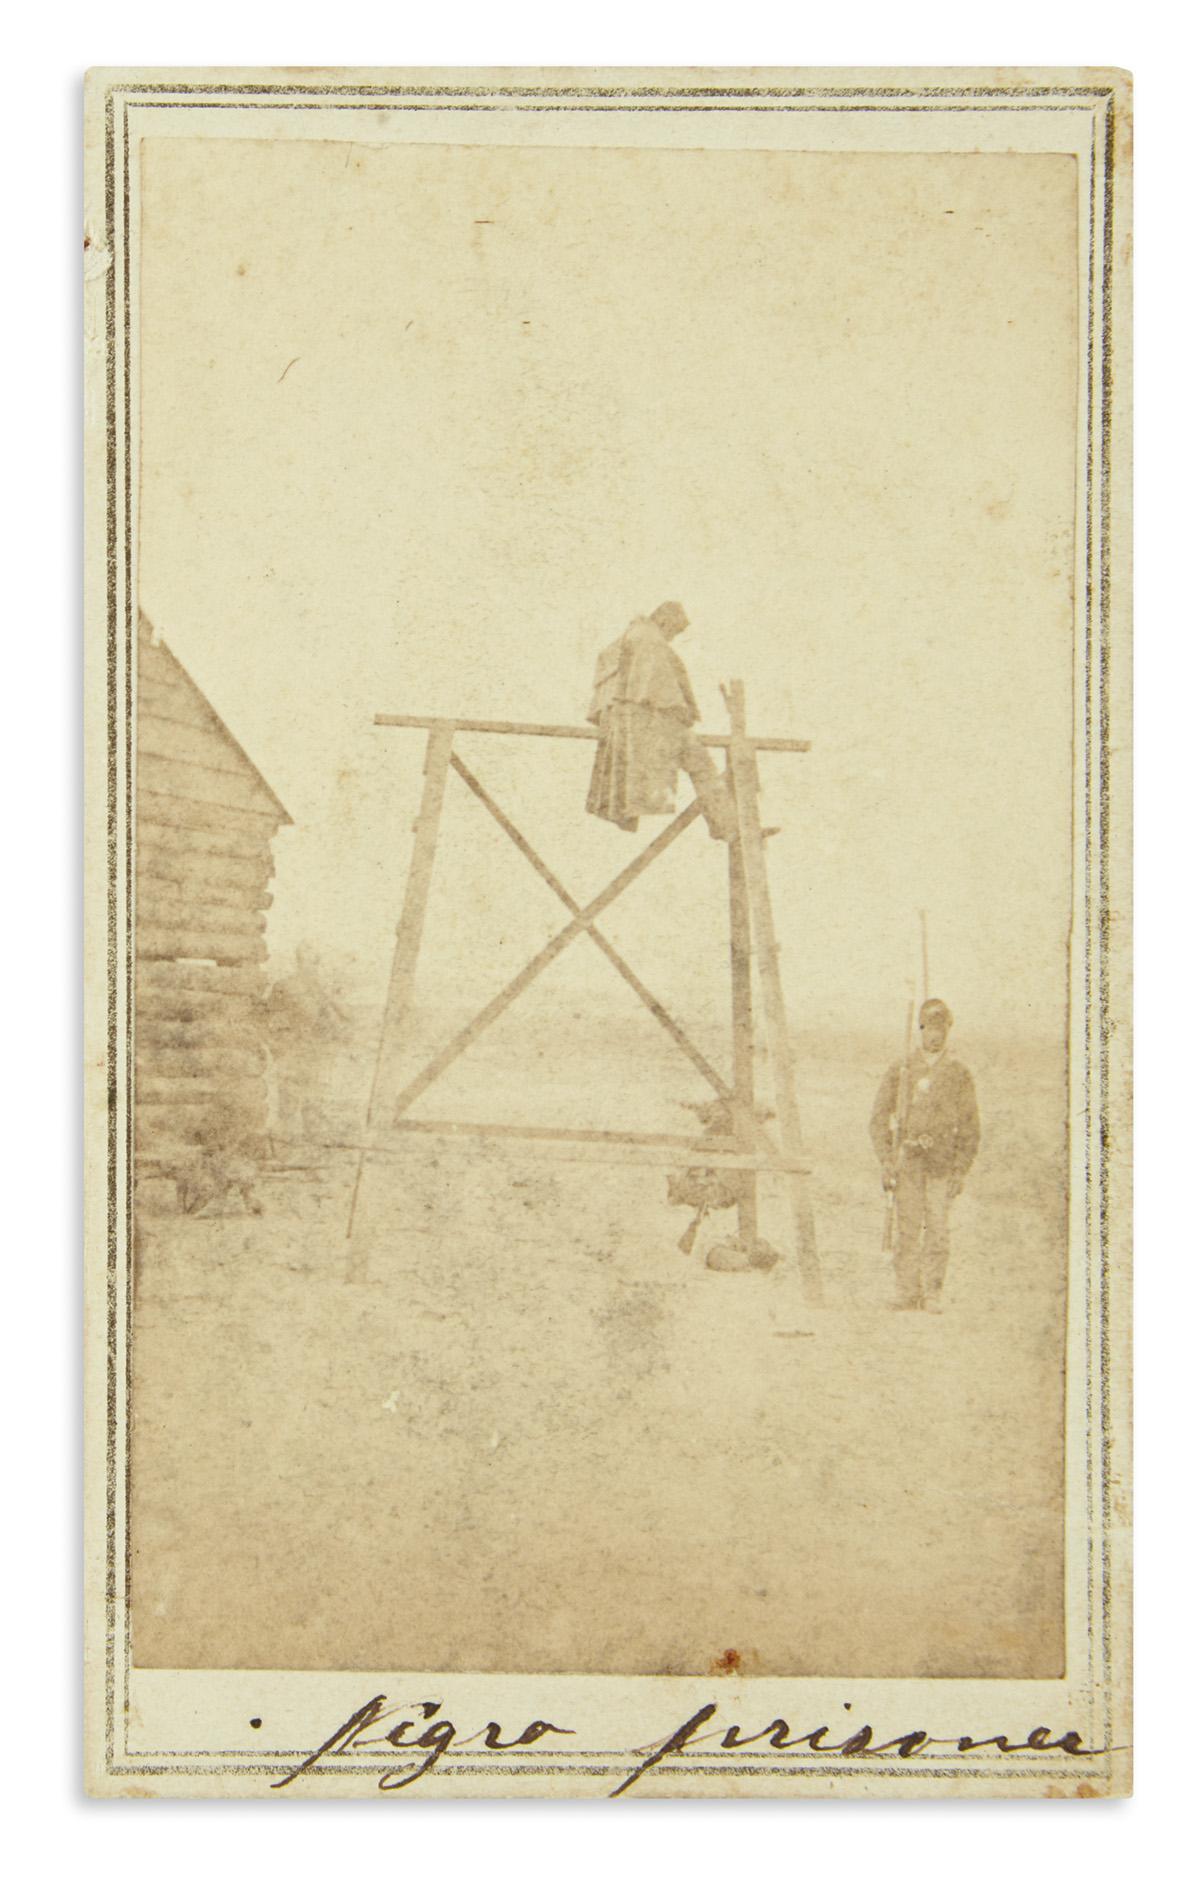 (MILITARY--CIVIL WAR.) Newell, Lafayette V.; photographer. Carte-de-visite punishment scene of a Negro prisoner at Point Lookout.